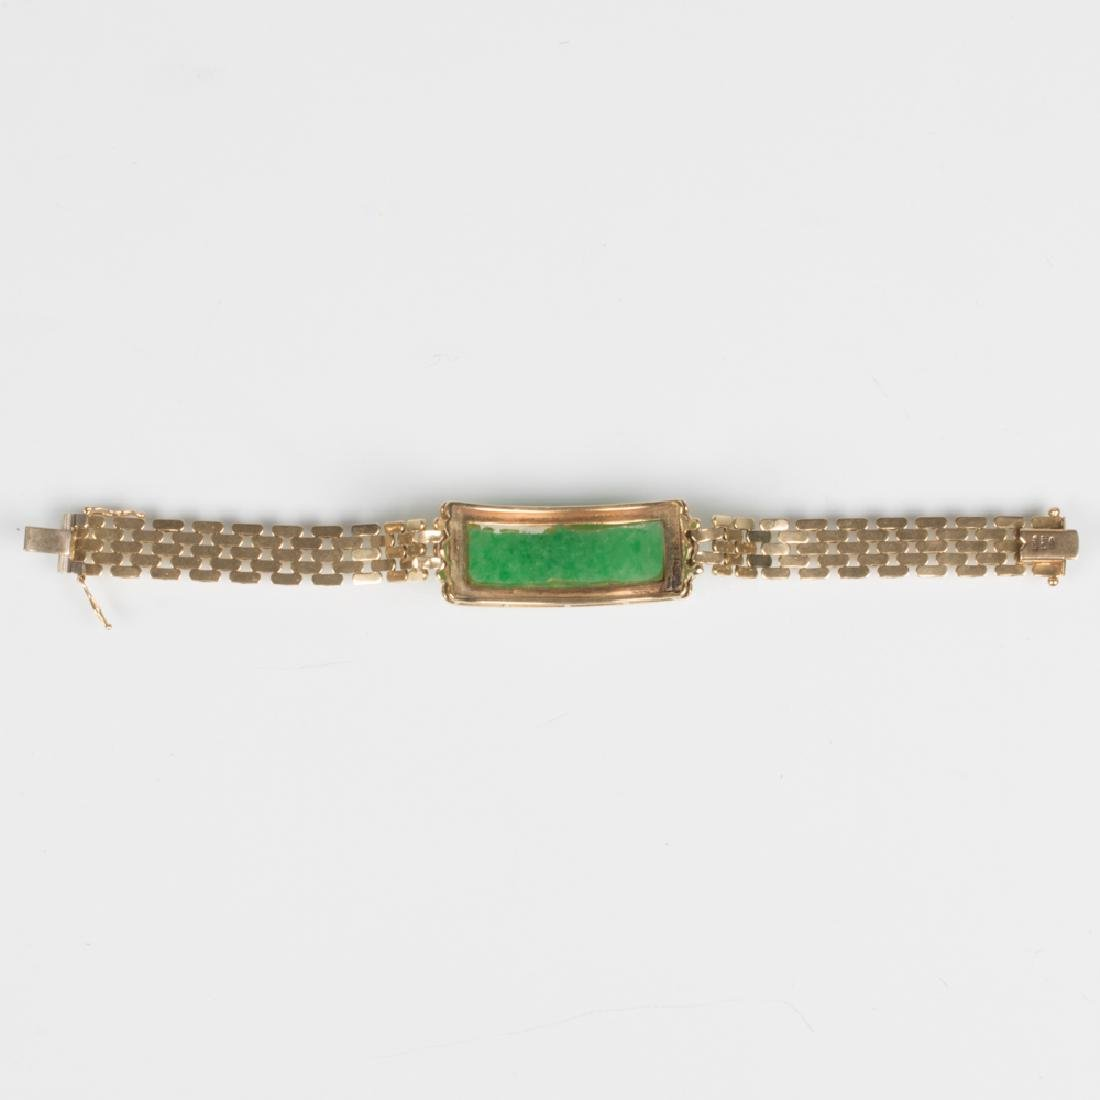 A 14kt. Yellow Gold, Green Jade and Diamond Bracelet, - 3